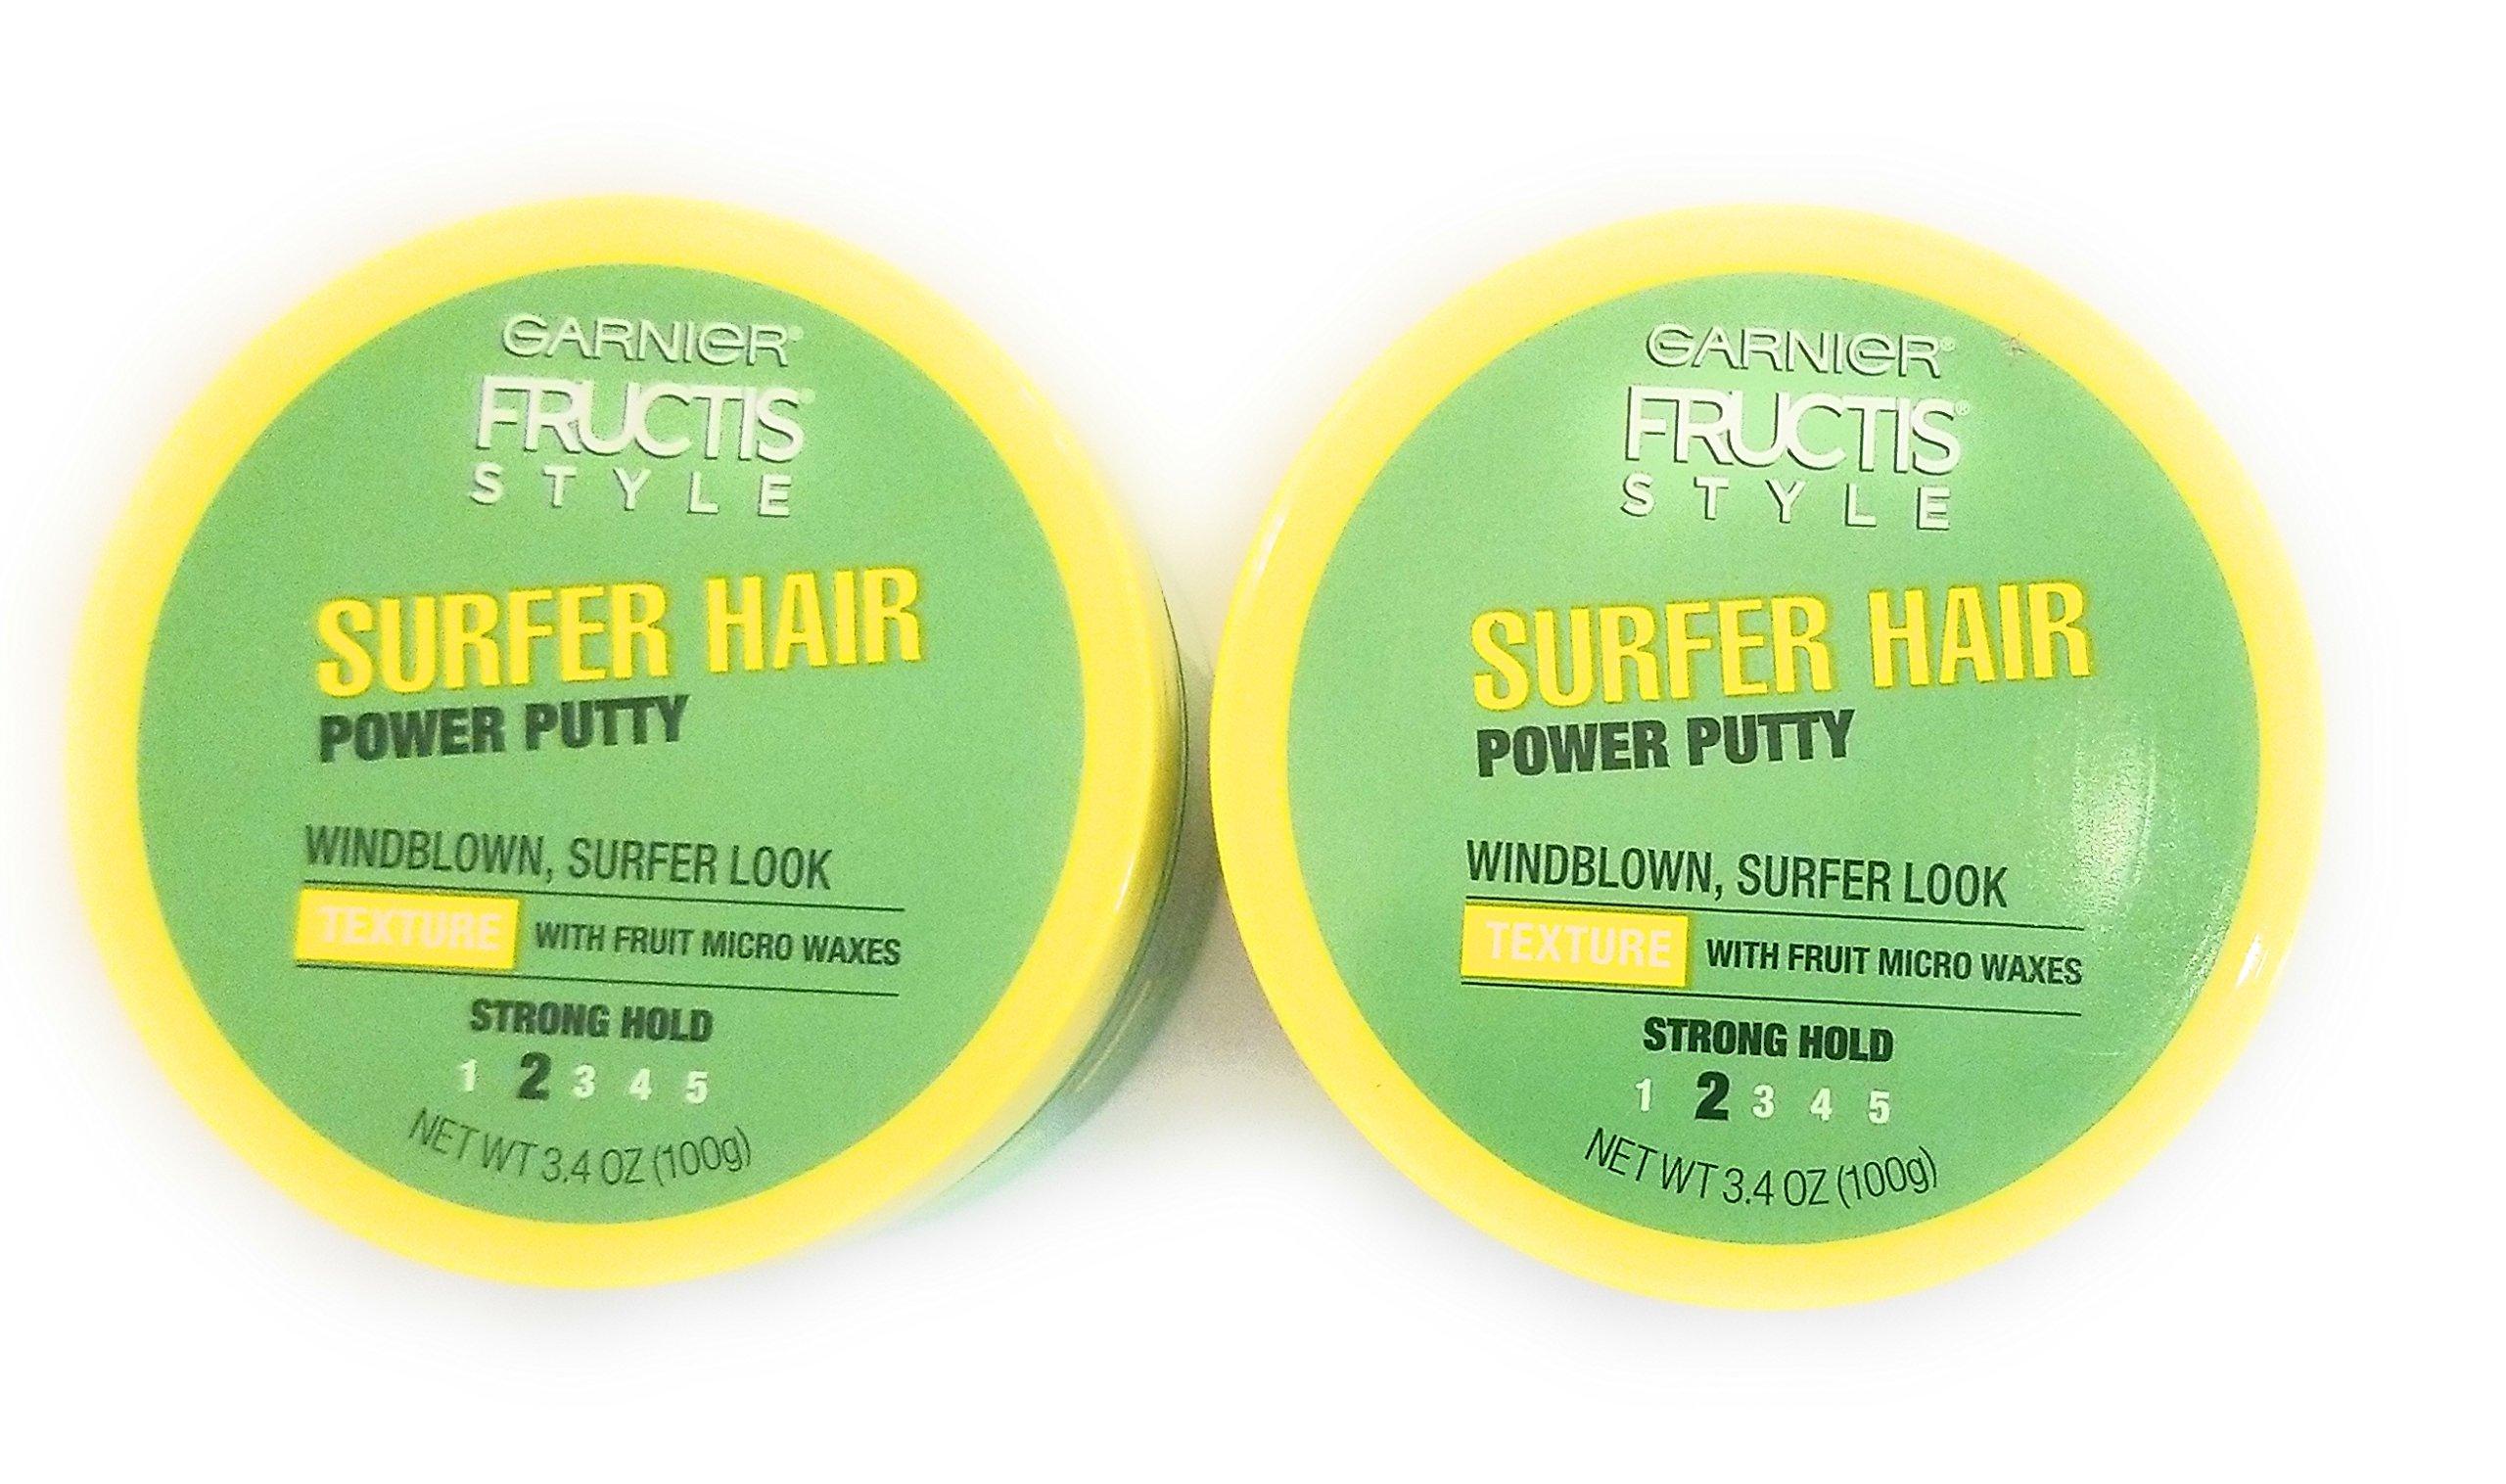 Garnier Fructis Style Surfer Hair Power Putty, 3 Ounce, 2 Pack by Garnier